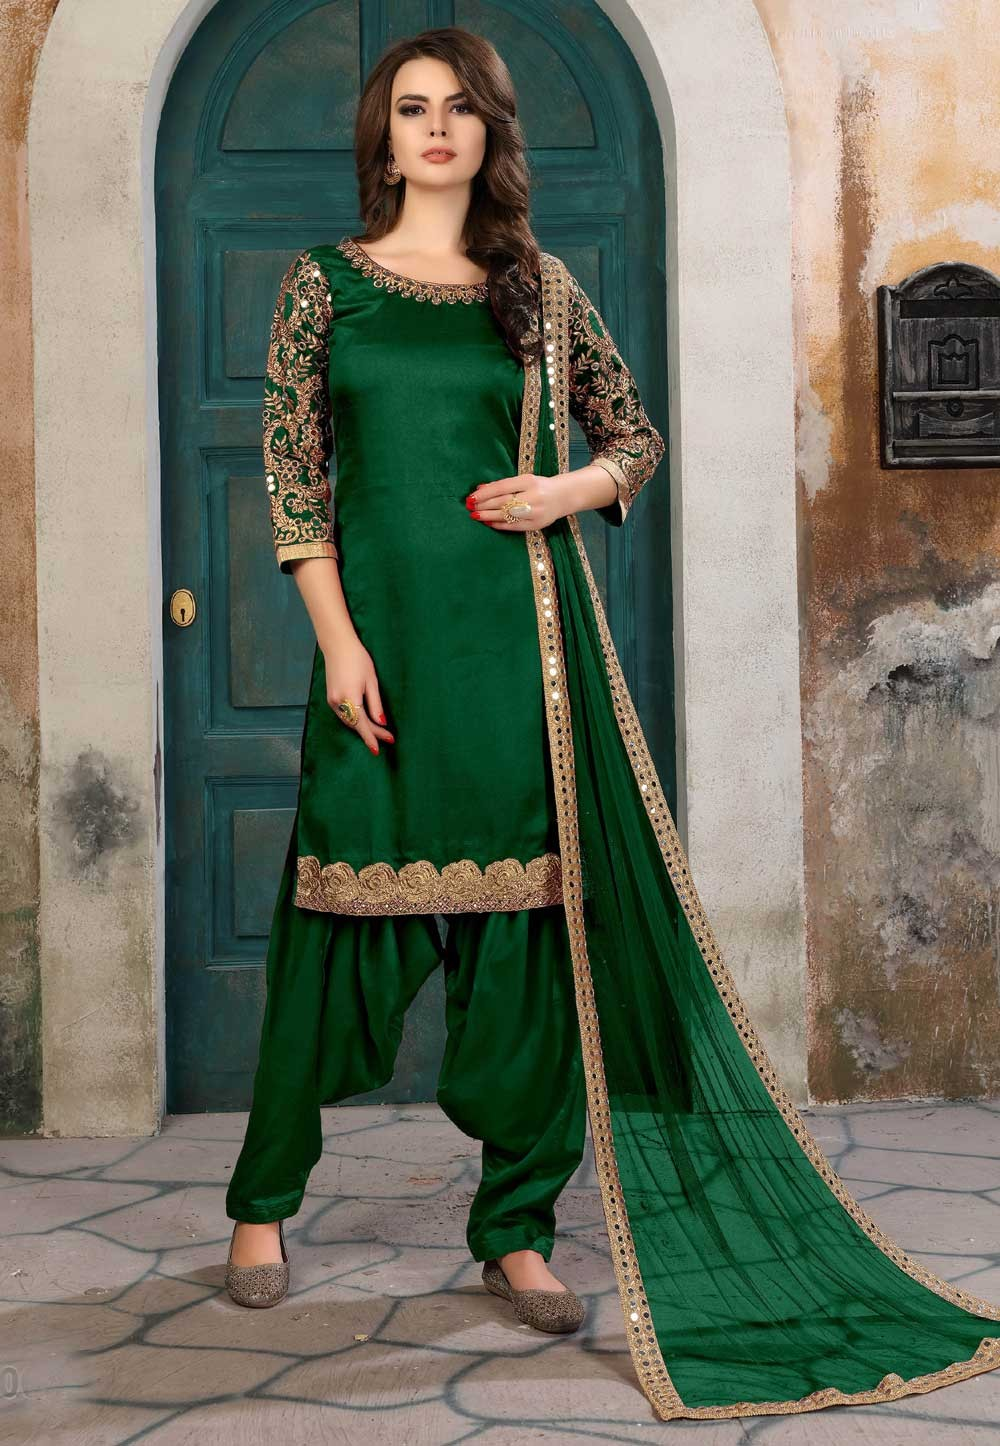 Designer Salwar Kameez in Green Color & Art Silk Fabric